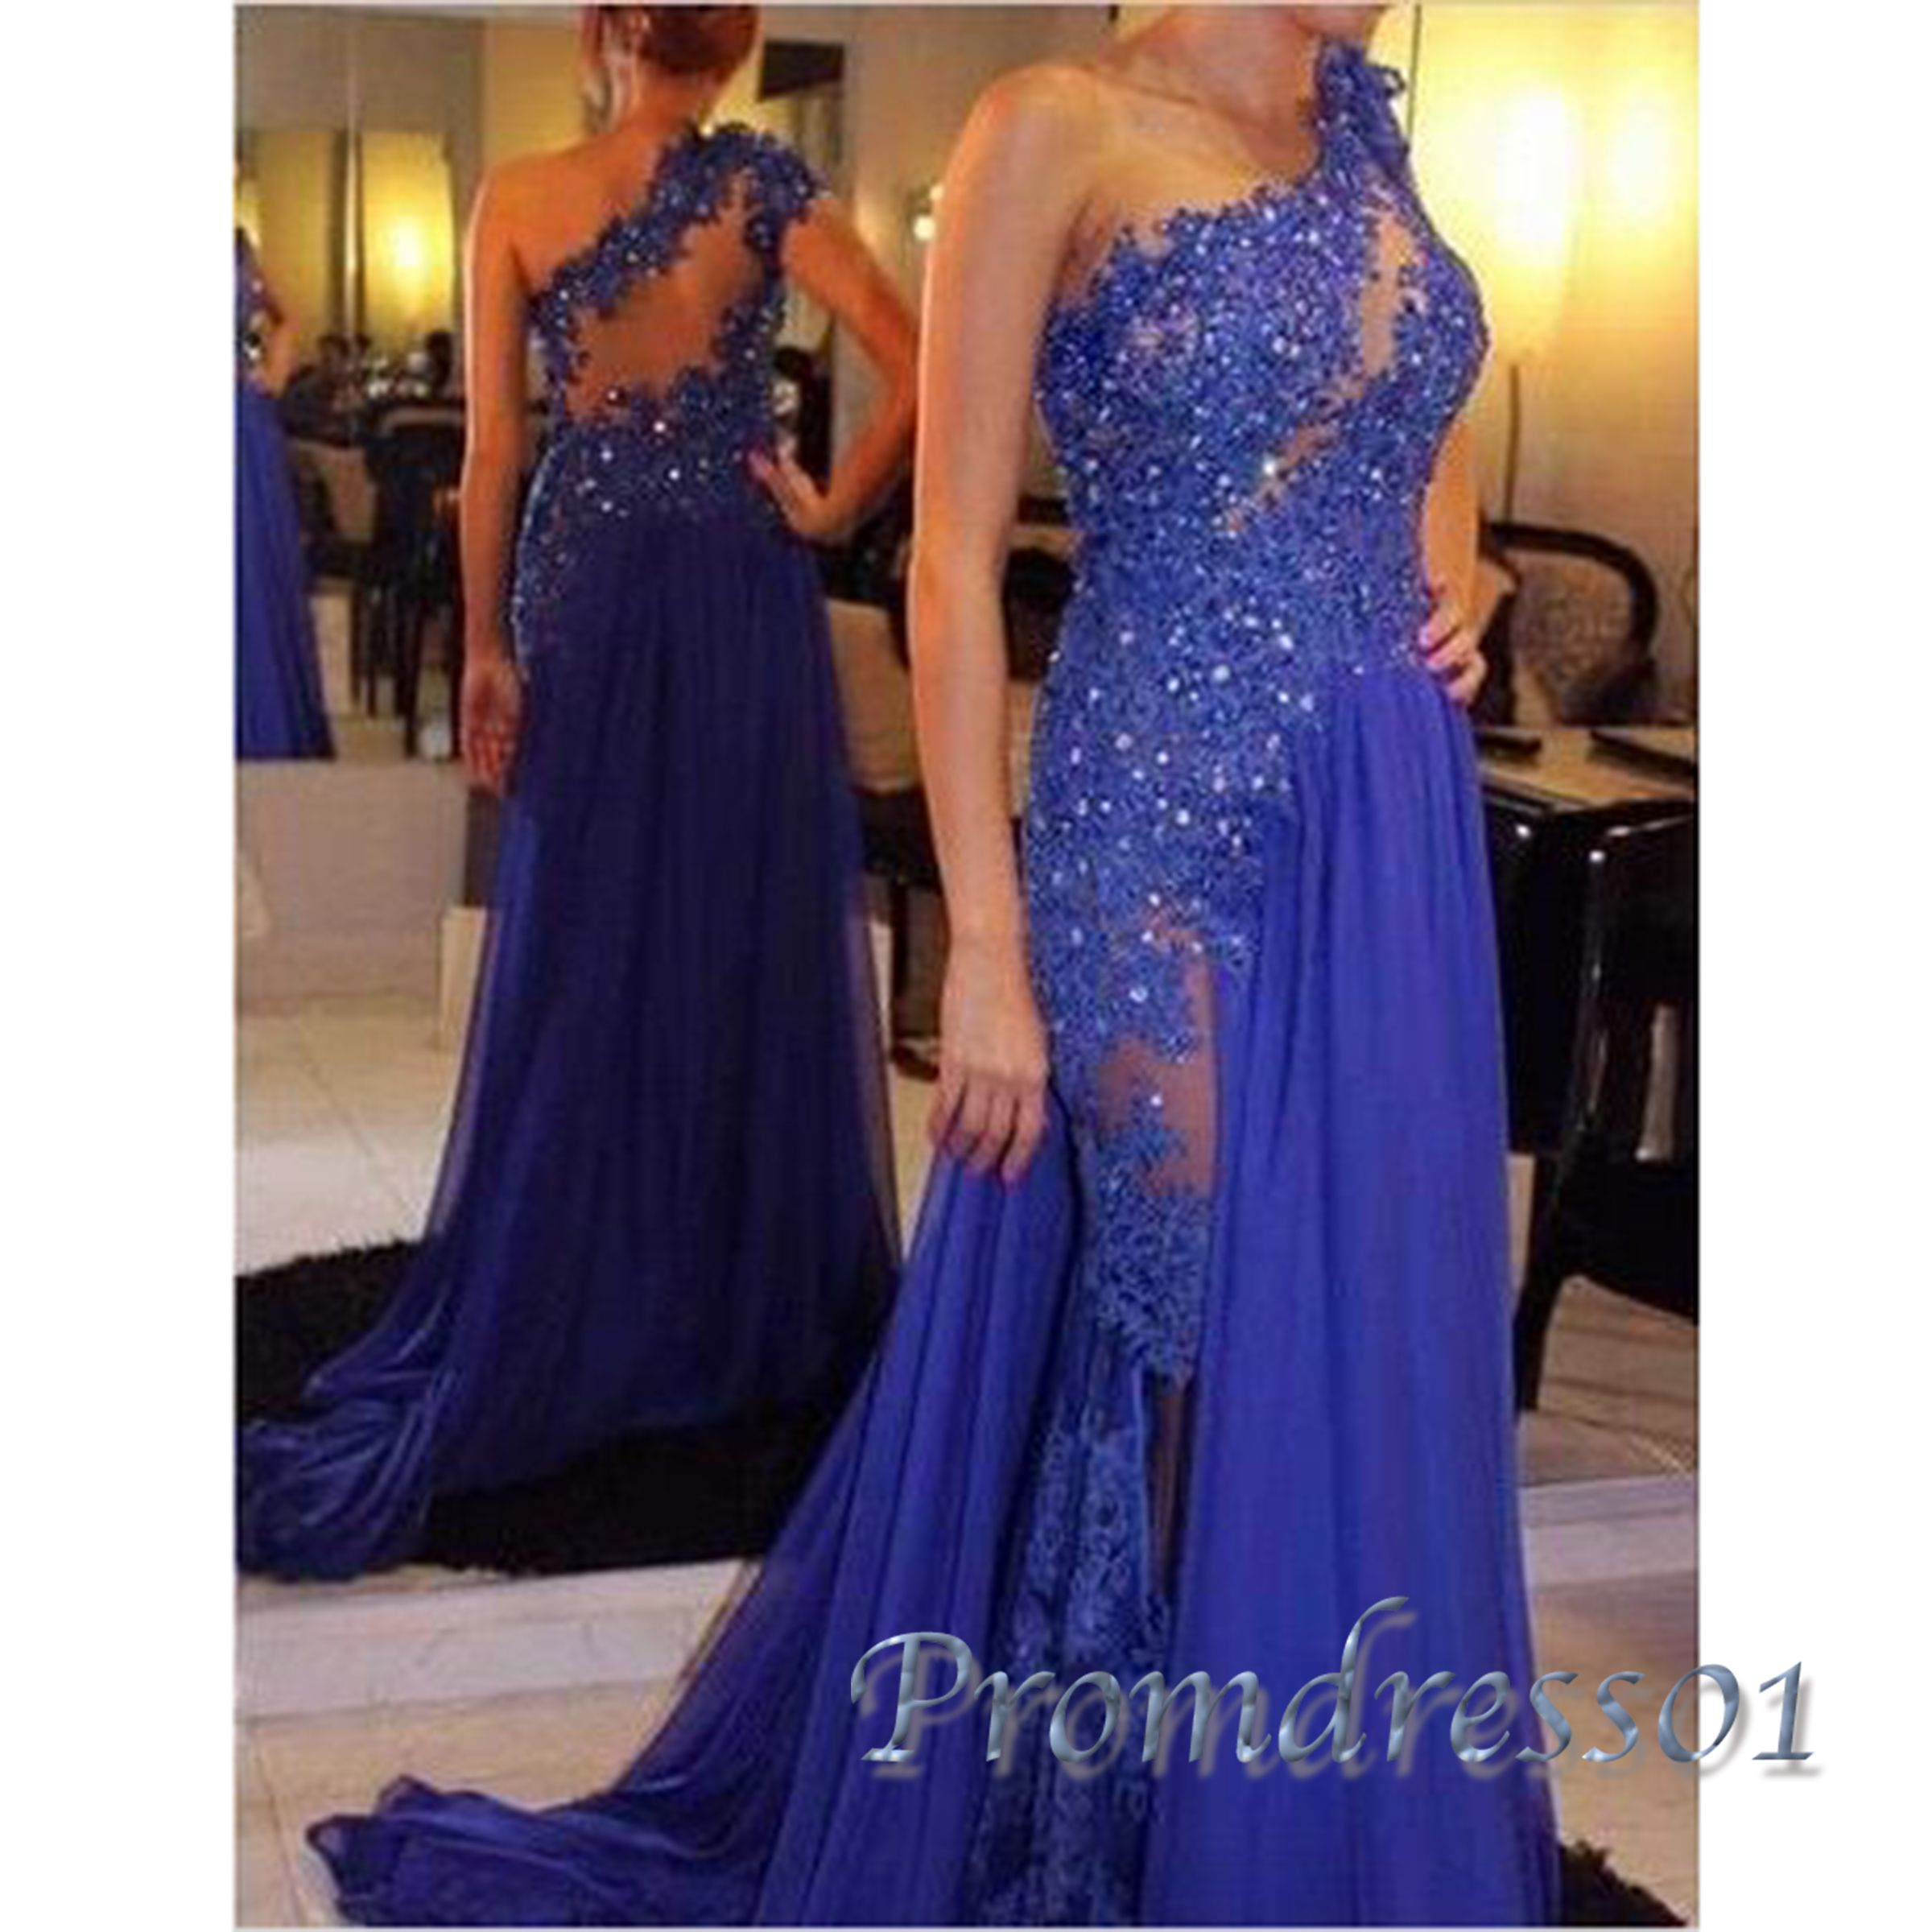 Elegant one shoulder loyal blue lace chiffon long prom dress with